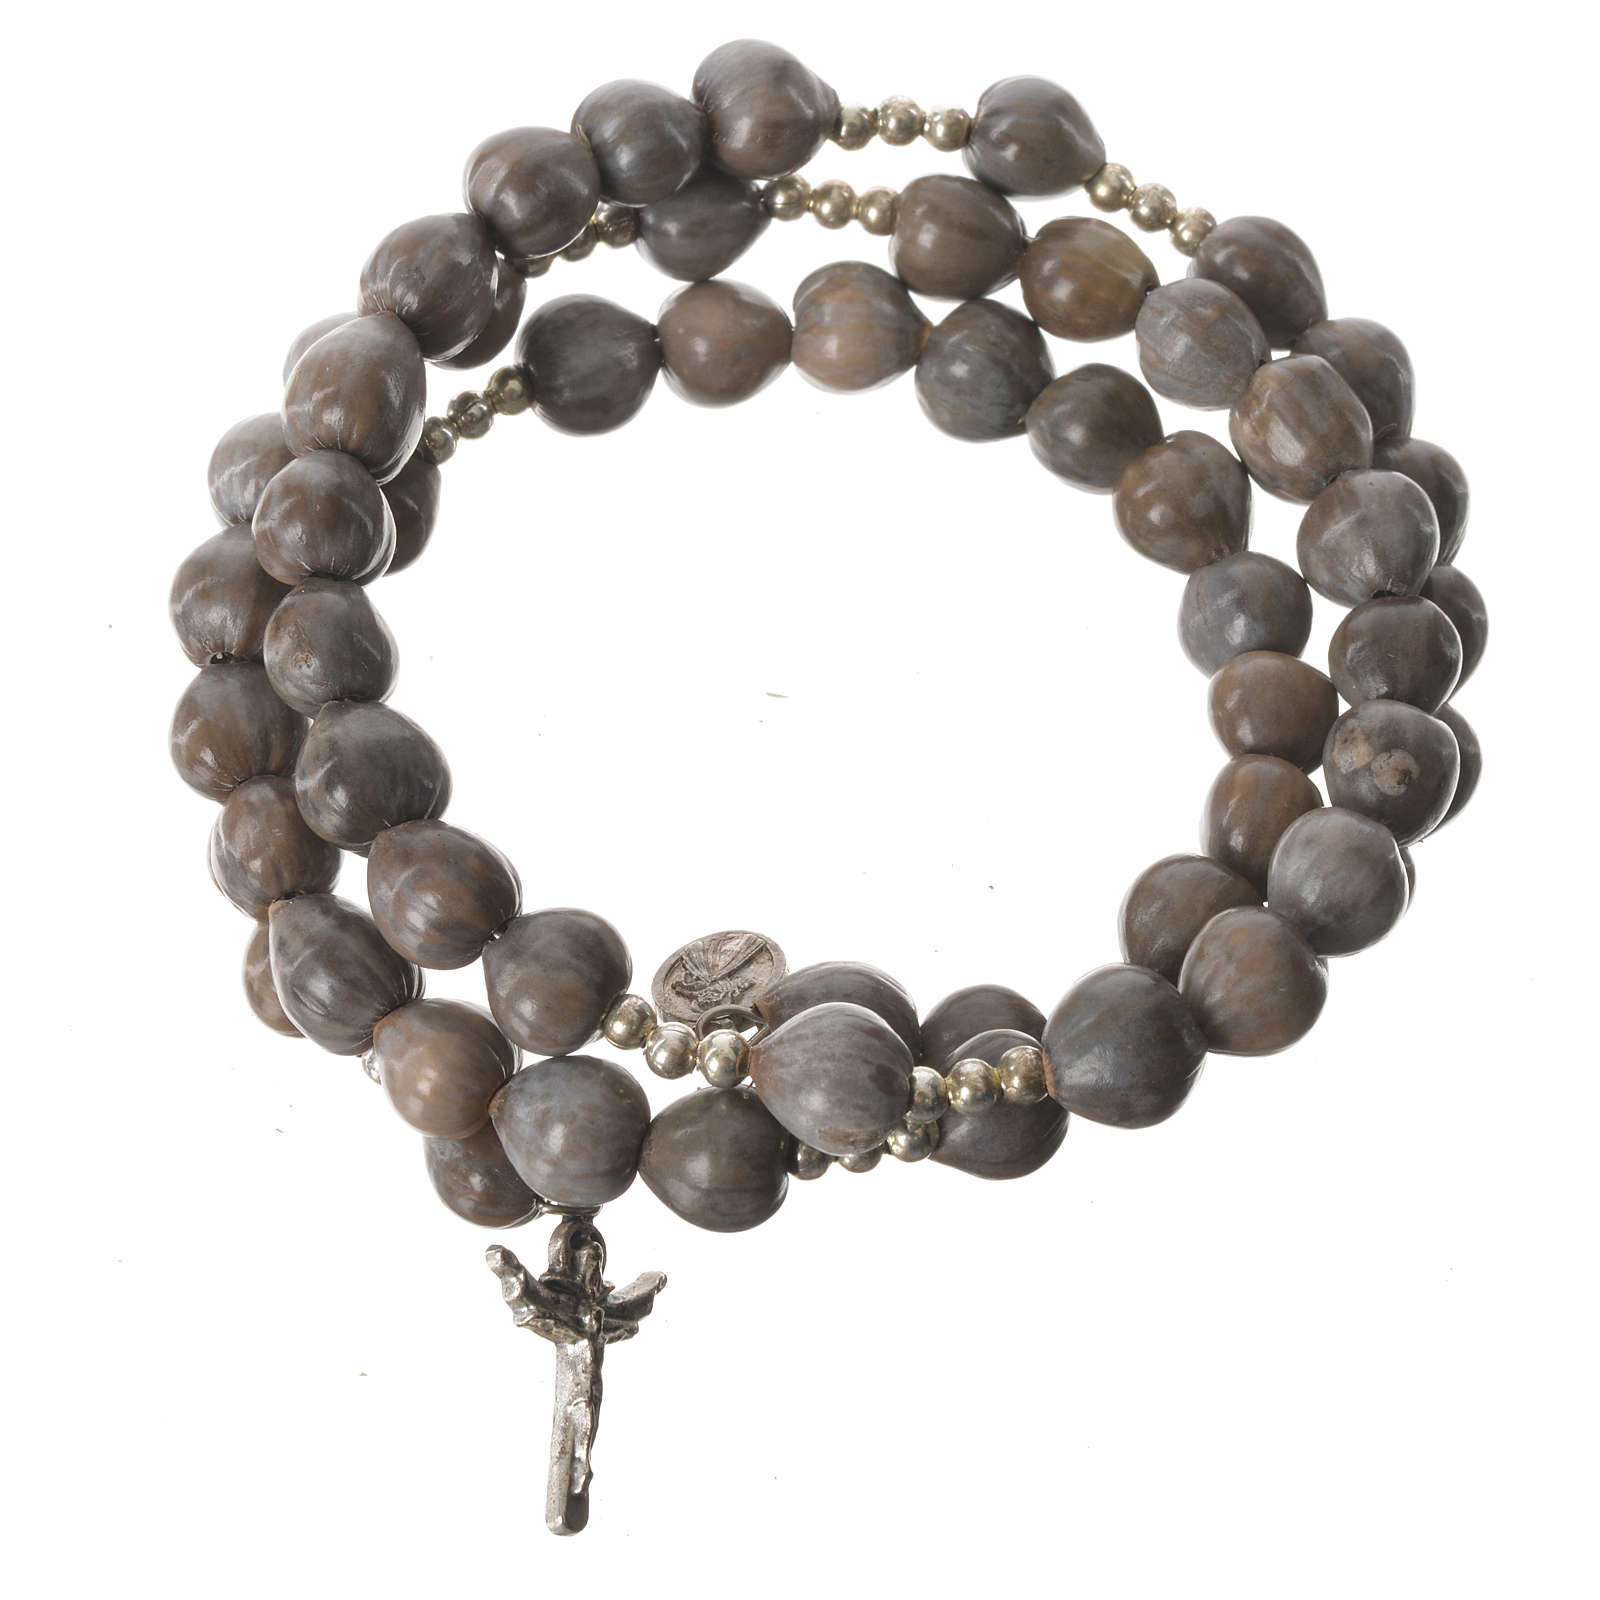 Bracelet Medjugorje spirale Croix Lacryma-jobi 4